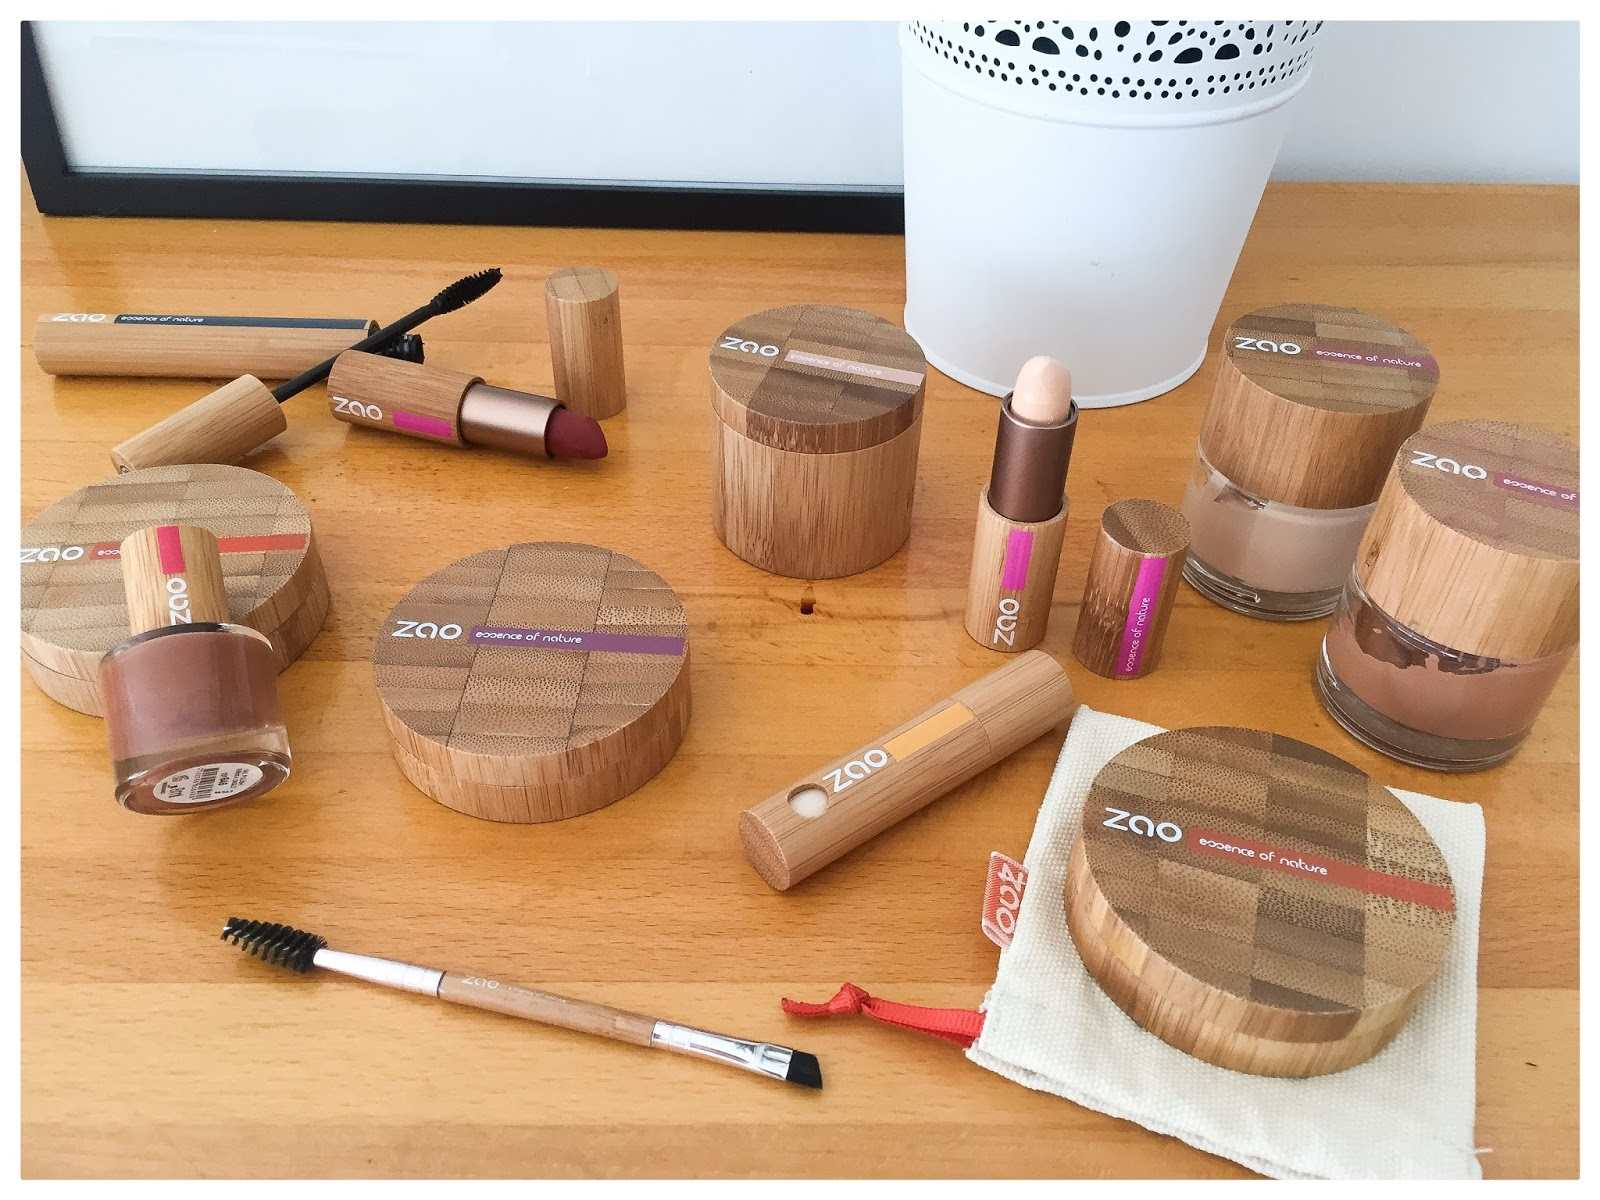 cosmetique durable